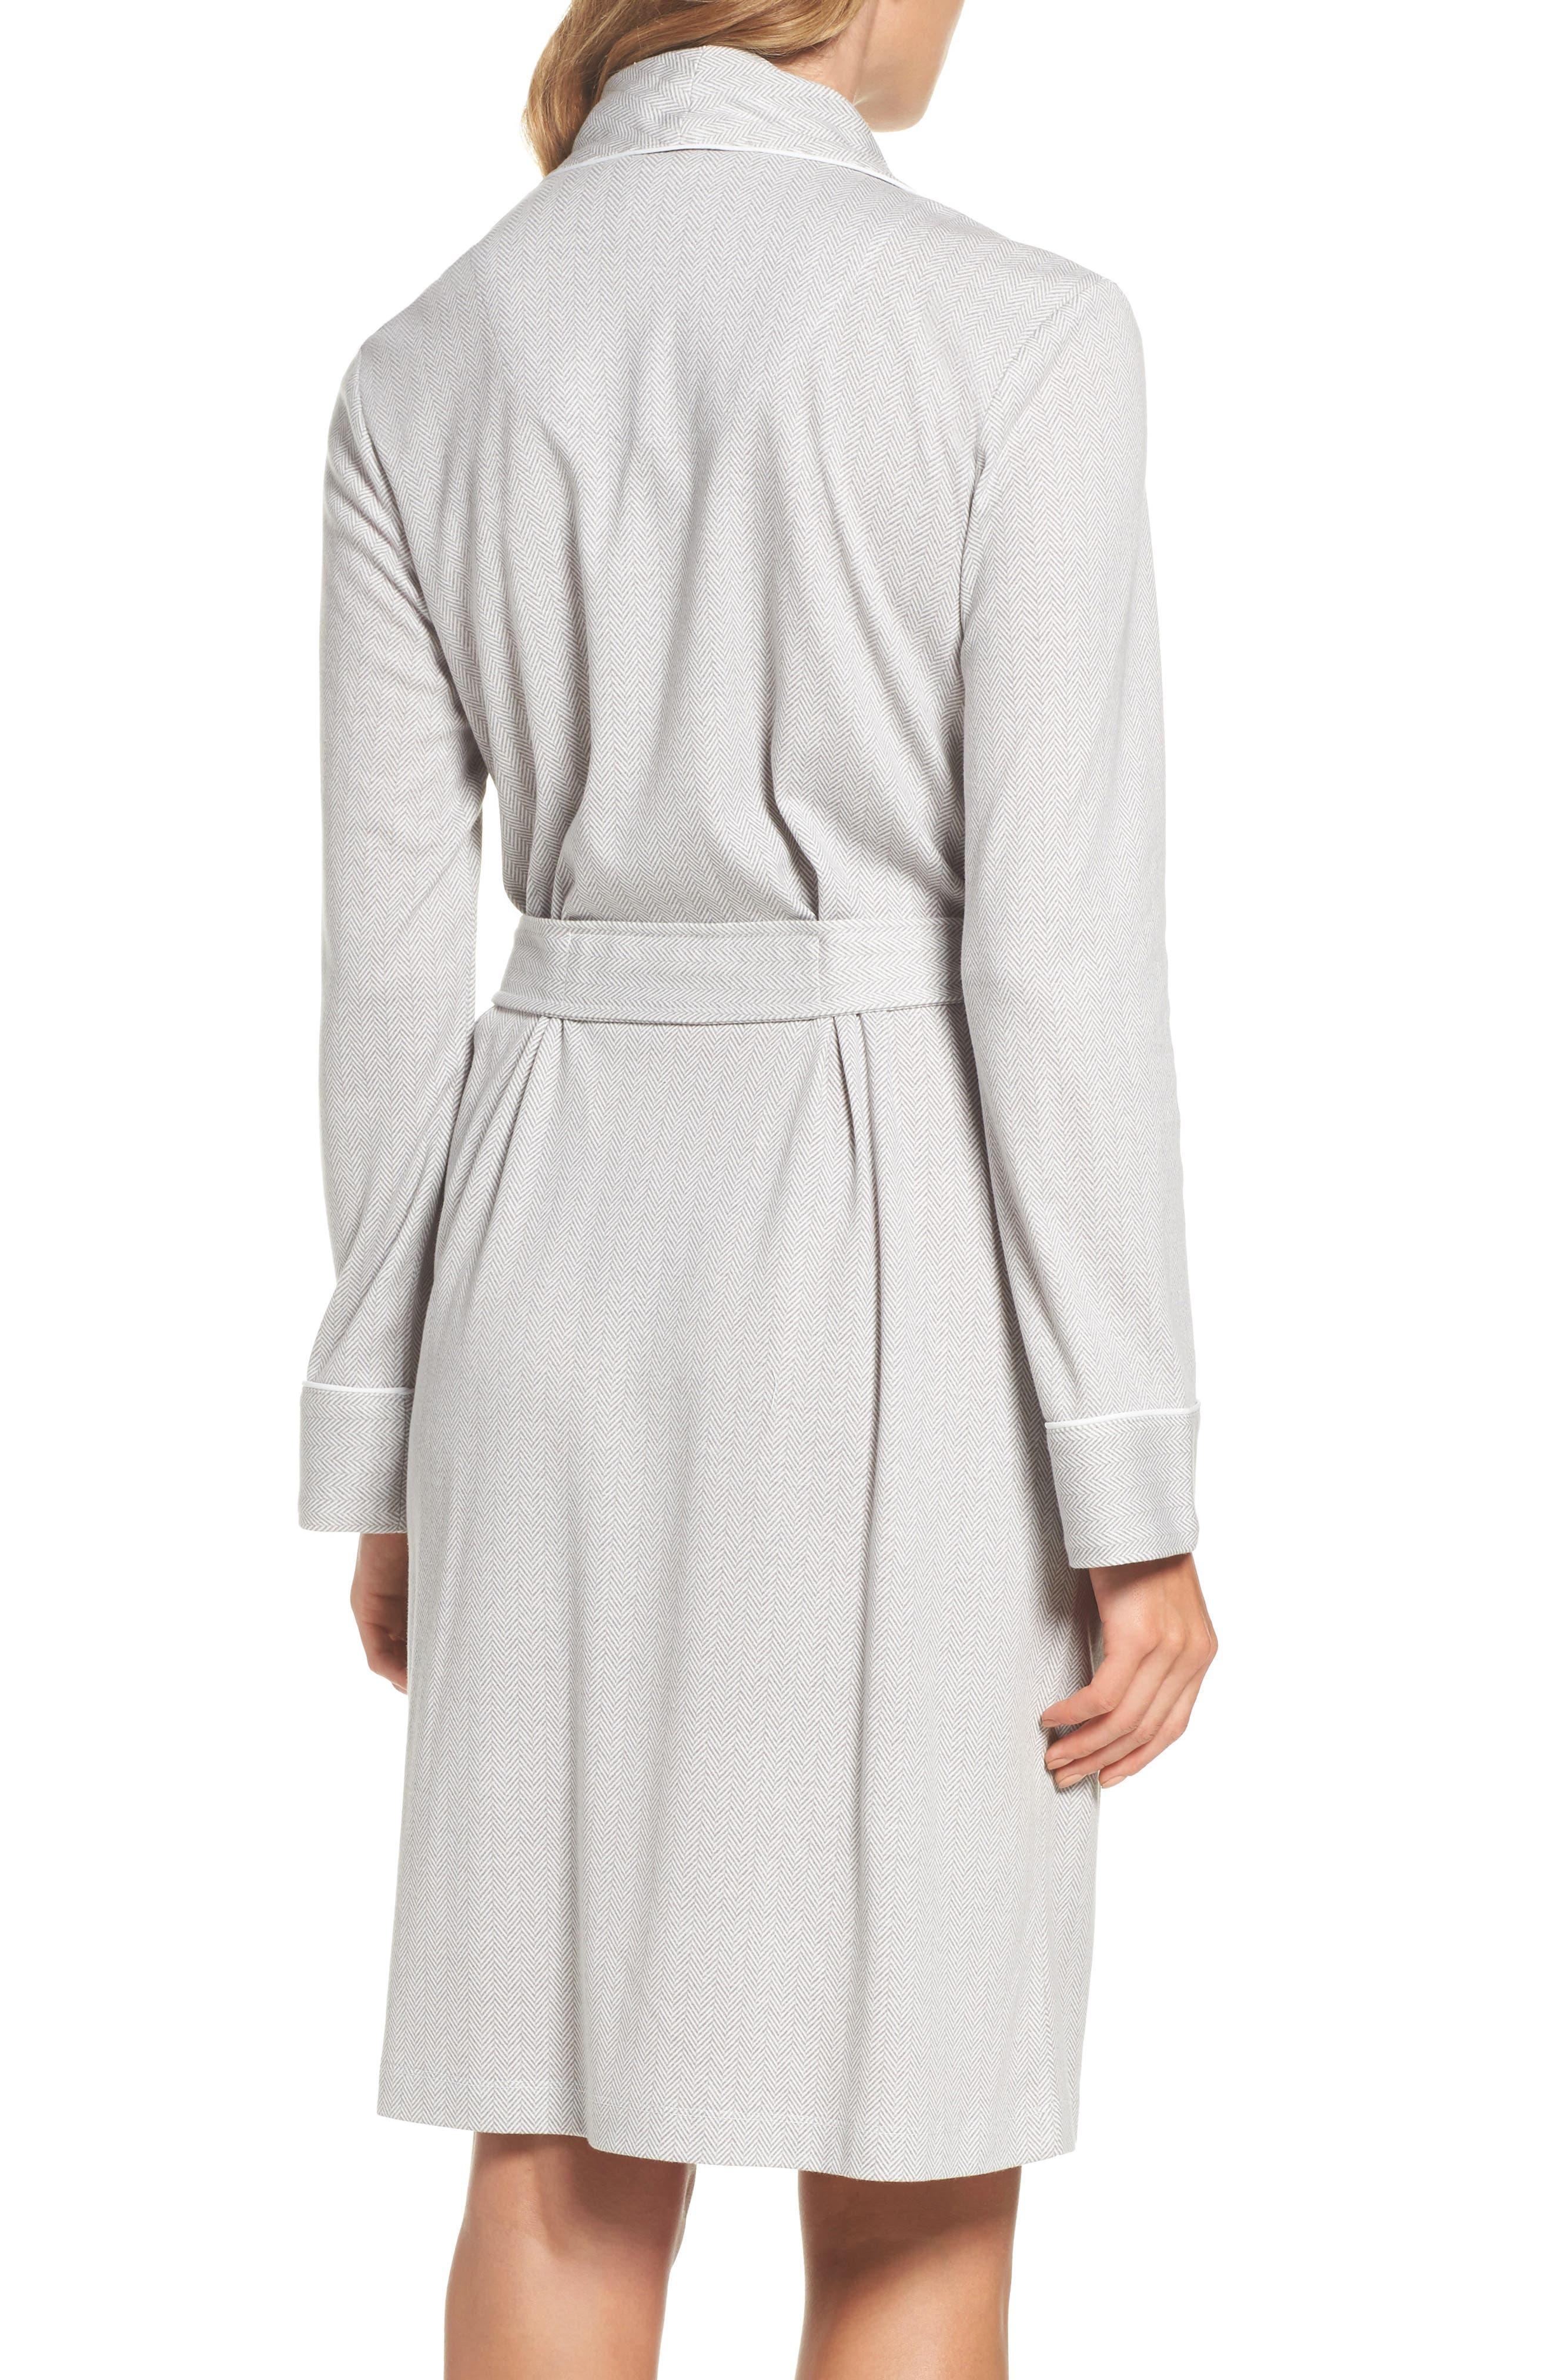 Short Robe,                             Alternate thumbnail 2, color,                             023